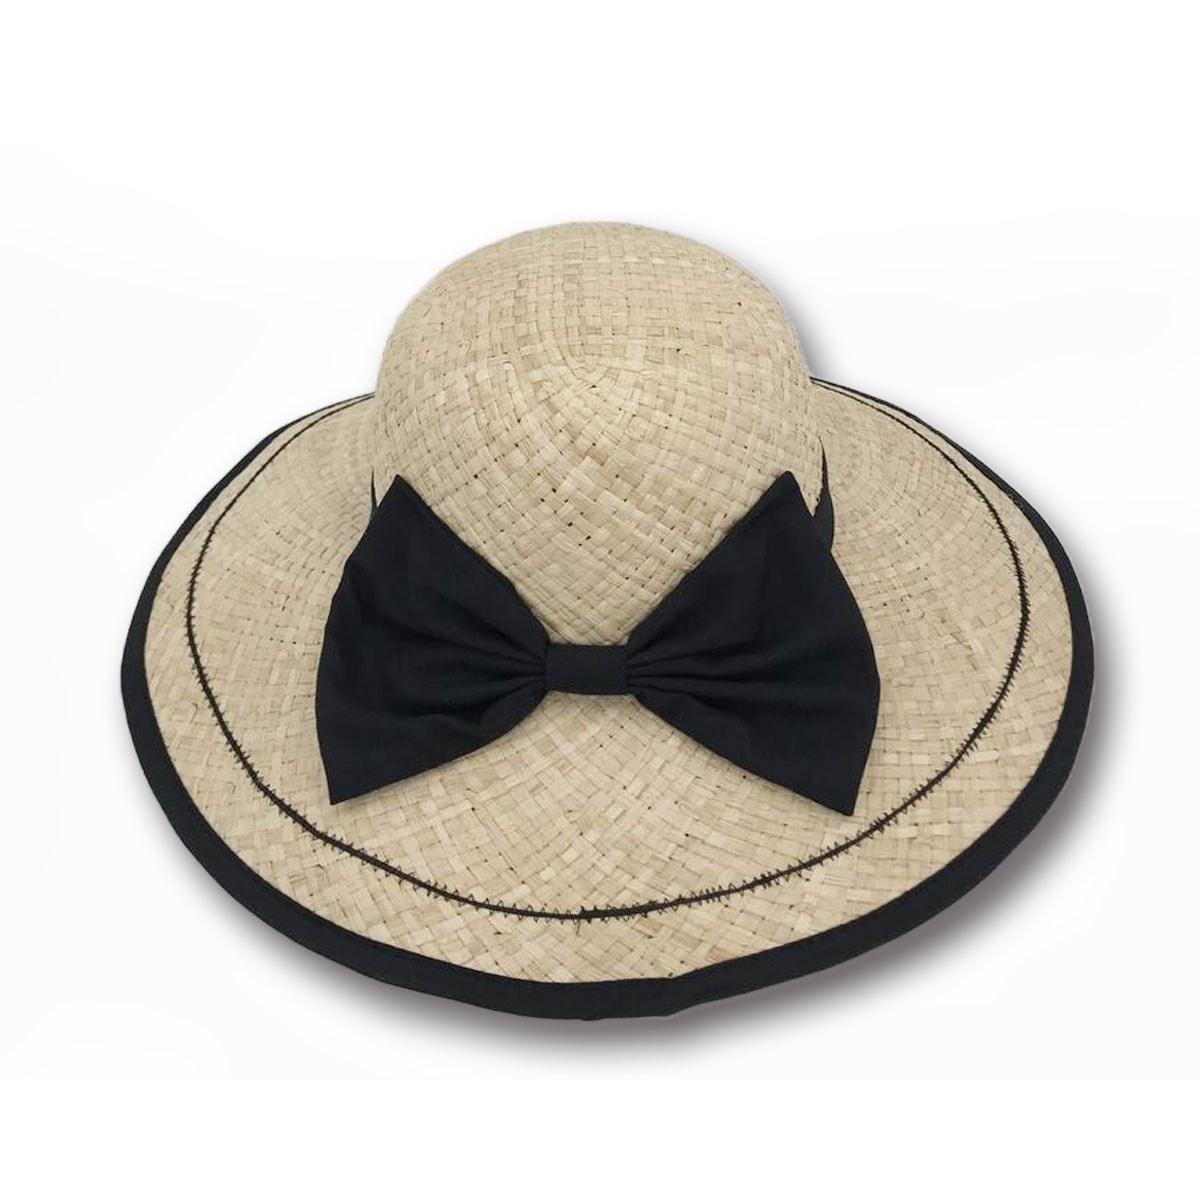 ACCESS HEADWEAR 100%拉菲亚蝴蝶结款时尚礼帽 女款 #米色 均码 怎么样 - 亚米网